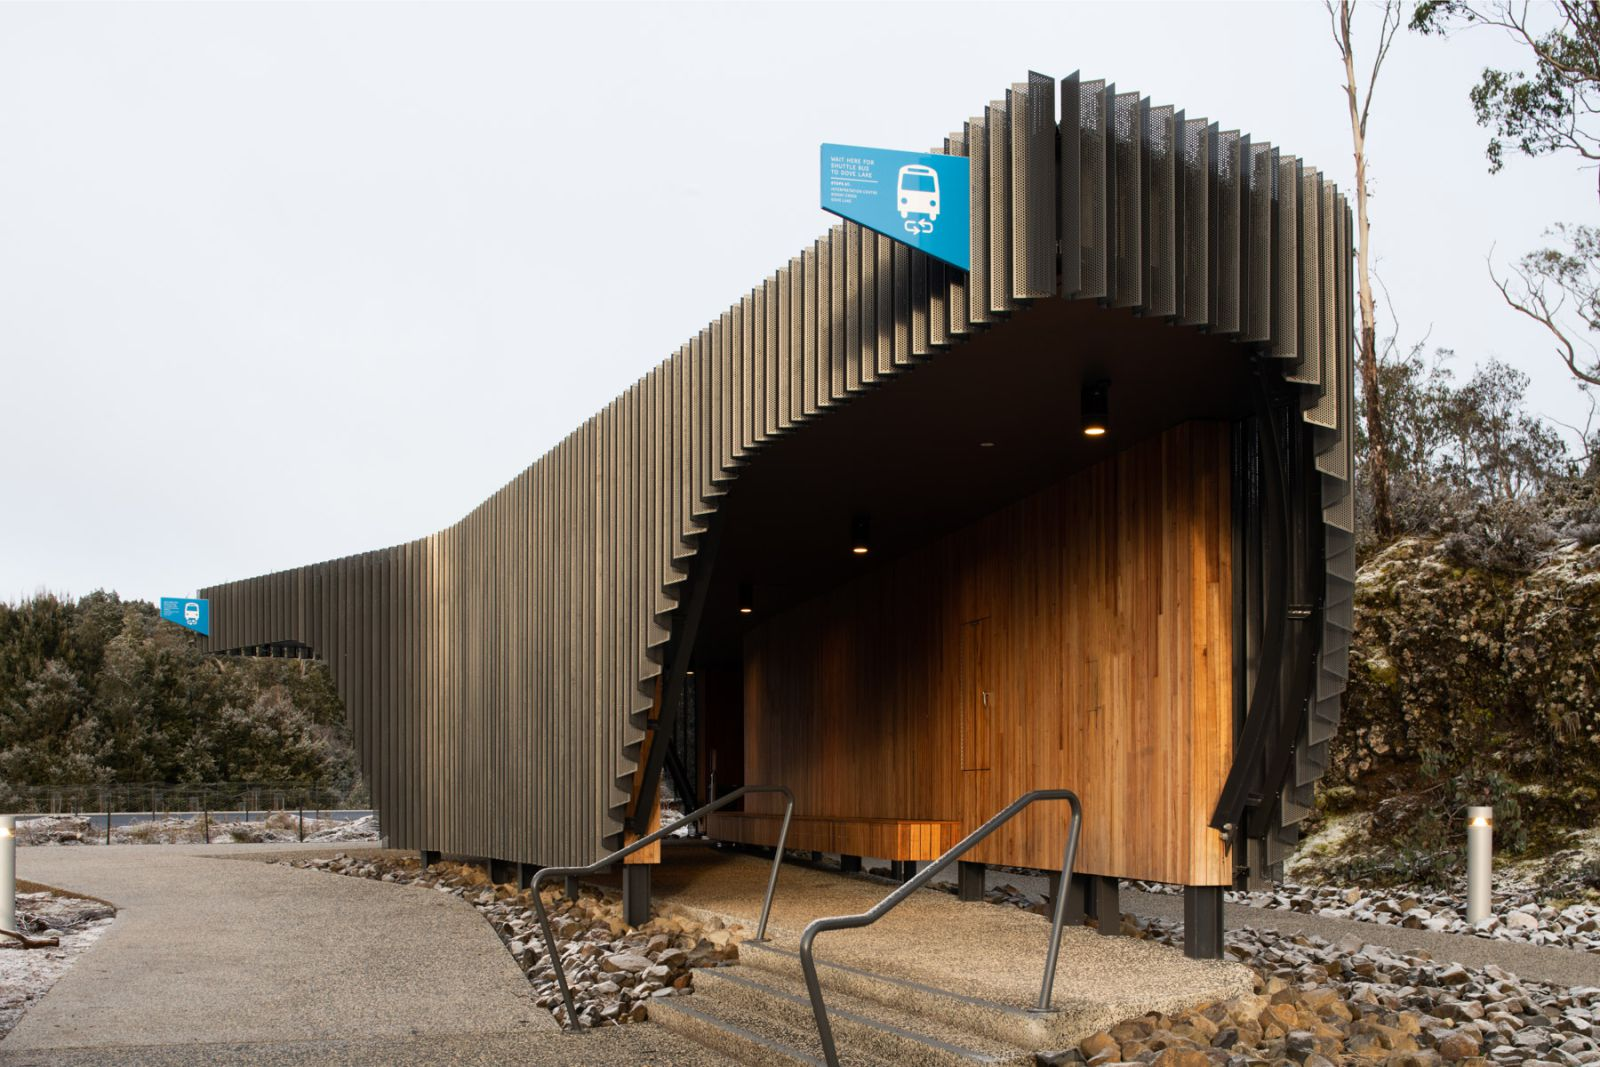 Cradle Mountain Visitor Centre